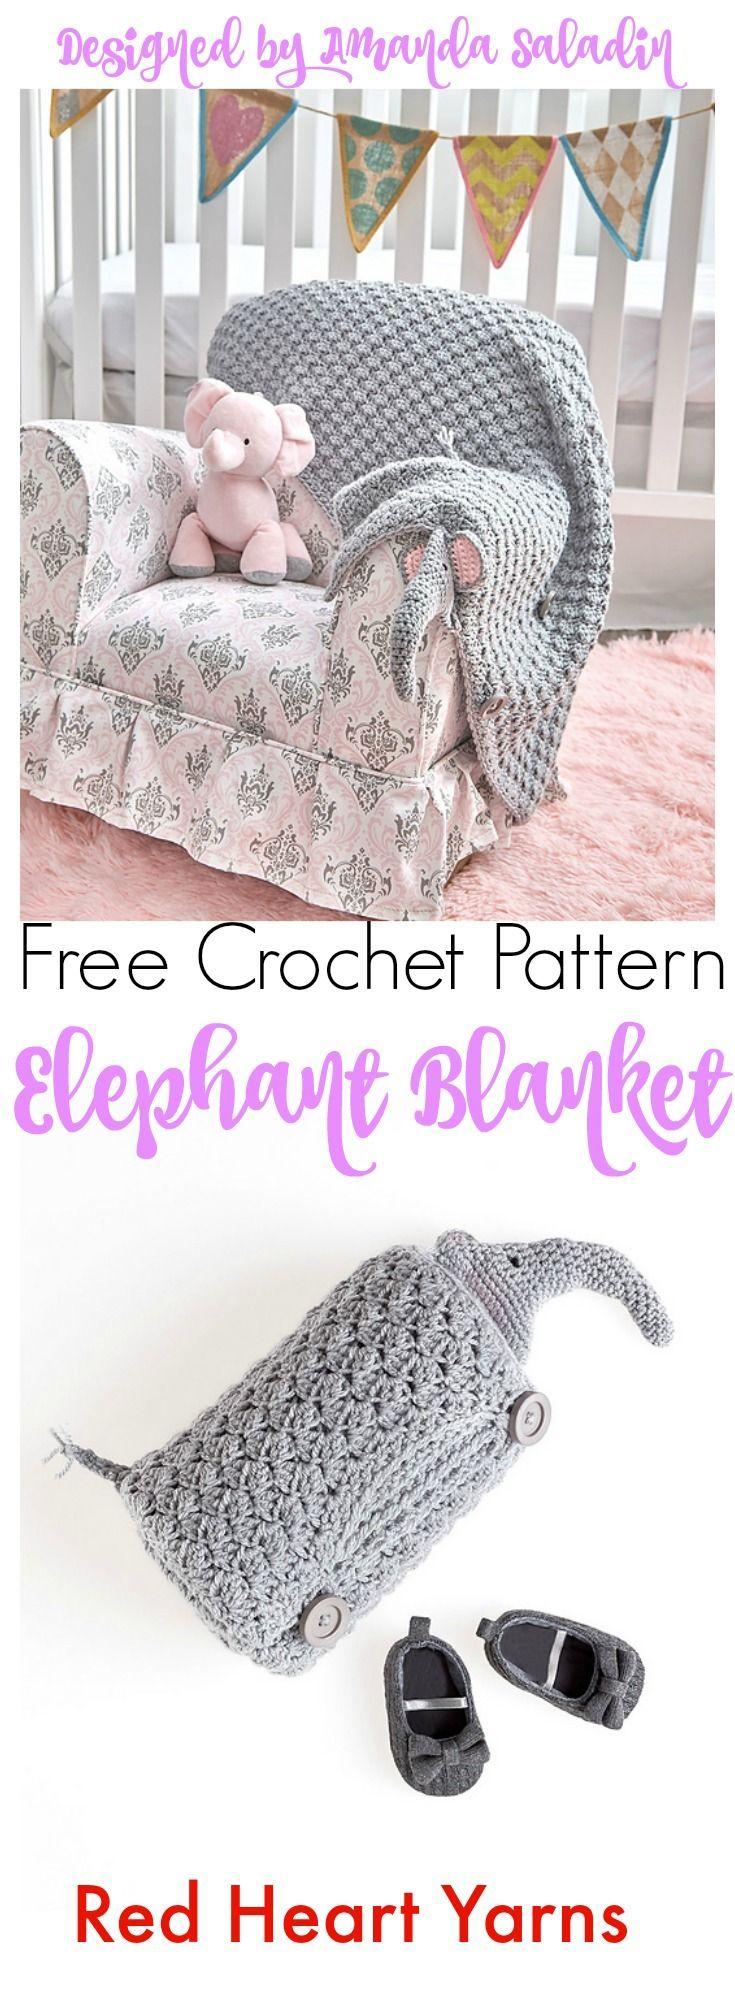 Mejores 254 imágenes de Crochet Afghans and Blankets en Pinterest ...